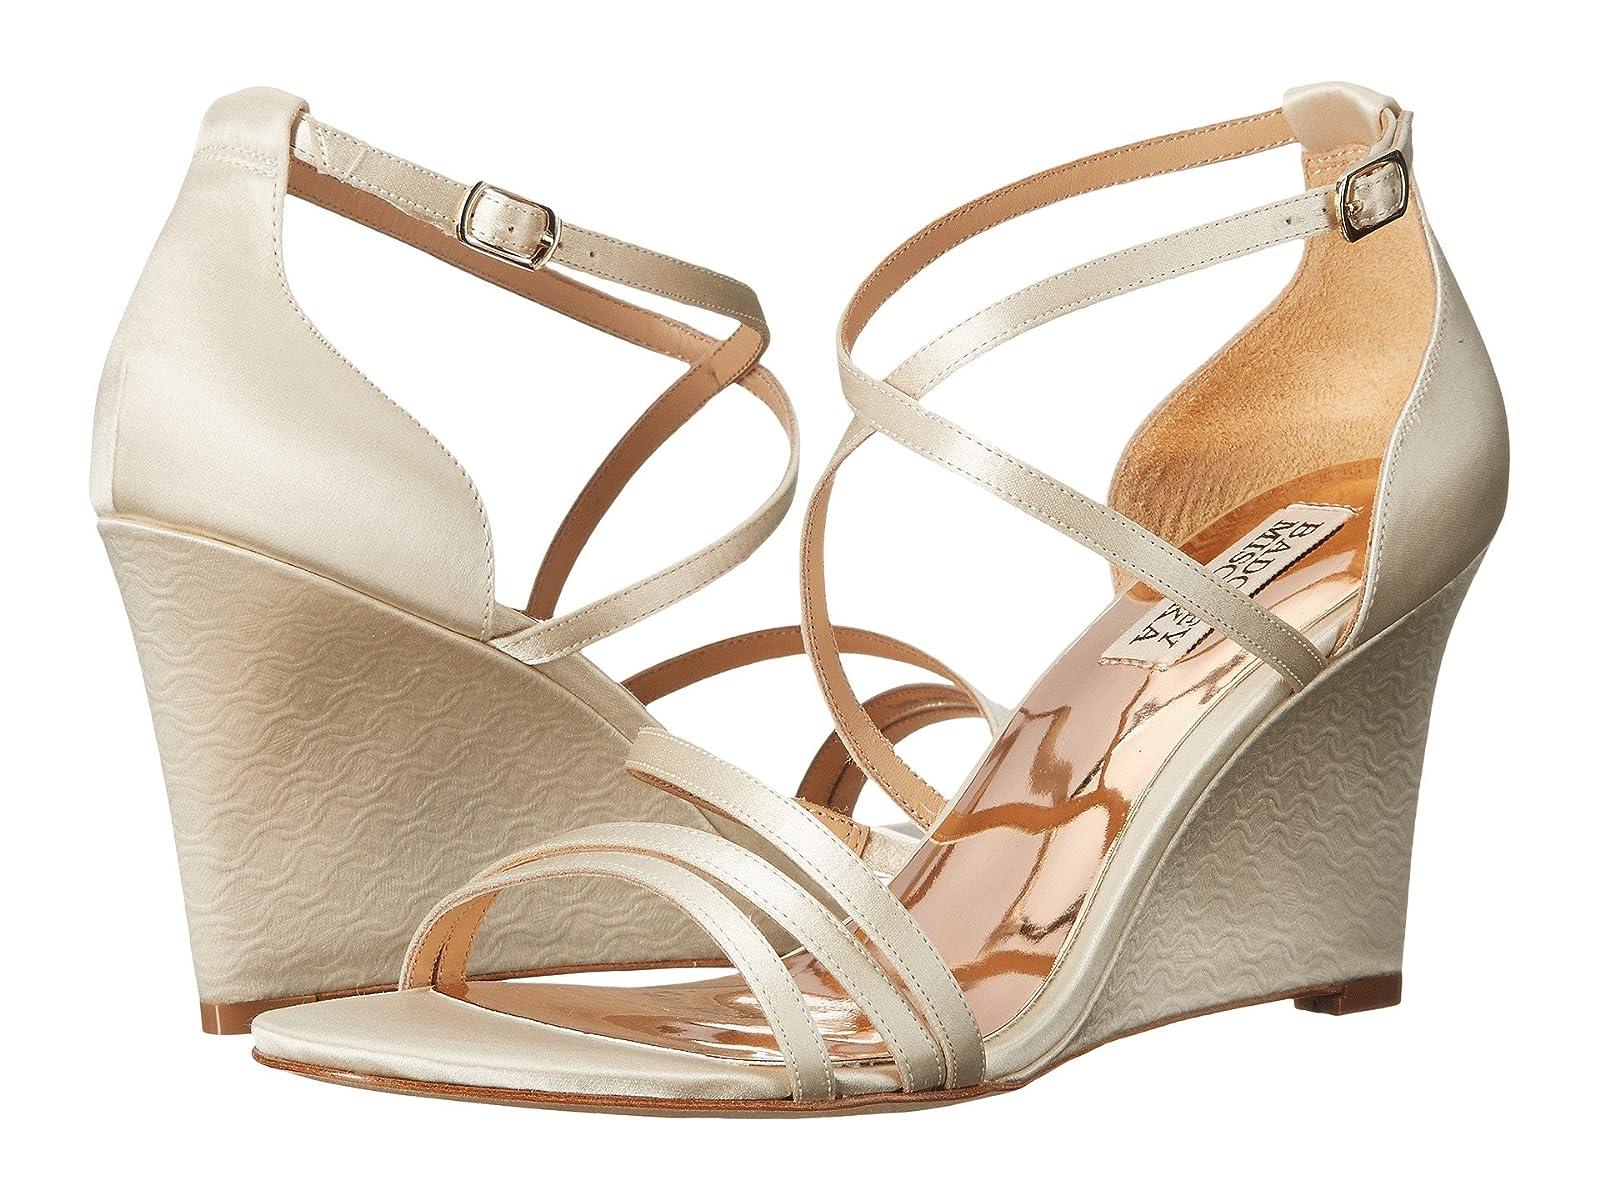 Badgley Mischka BonanzaCheap and distinctive eye-catching shoes